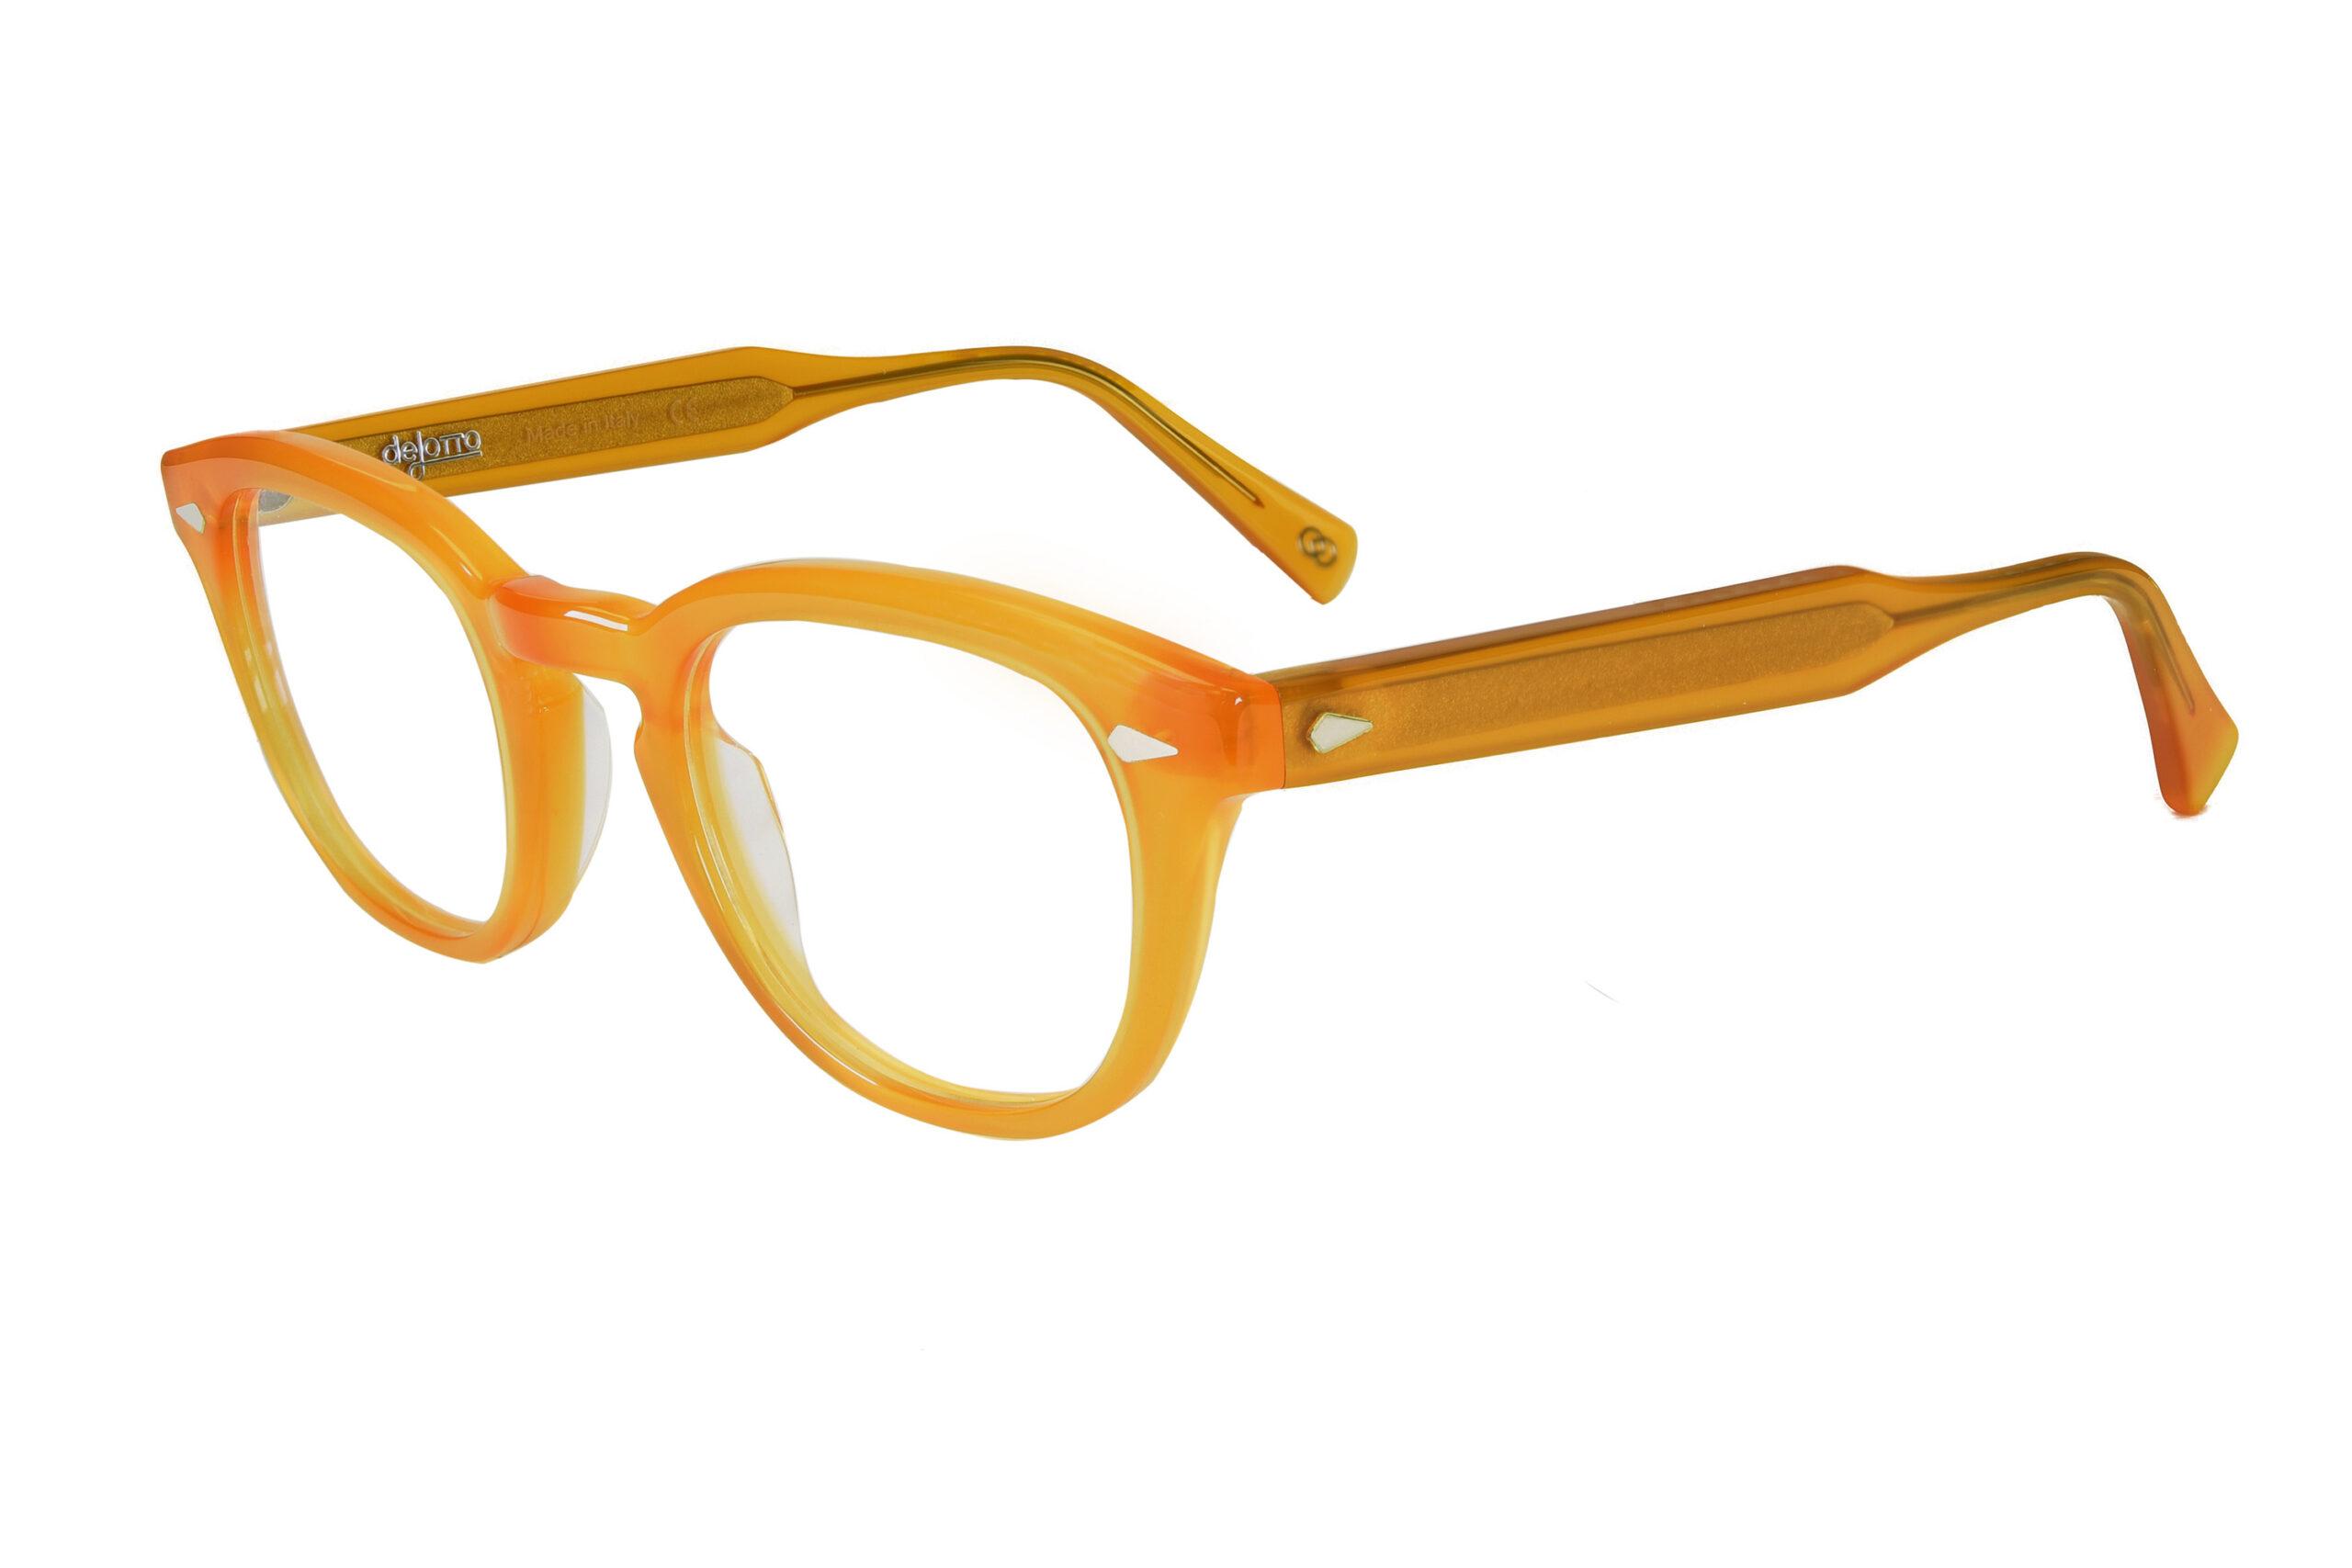 DL 11 c.8006 – Yellow